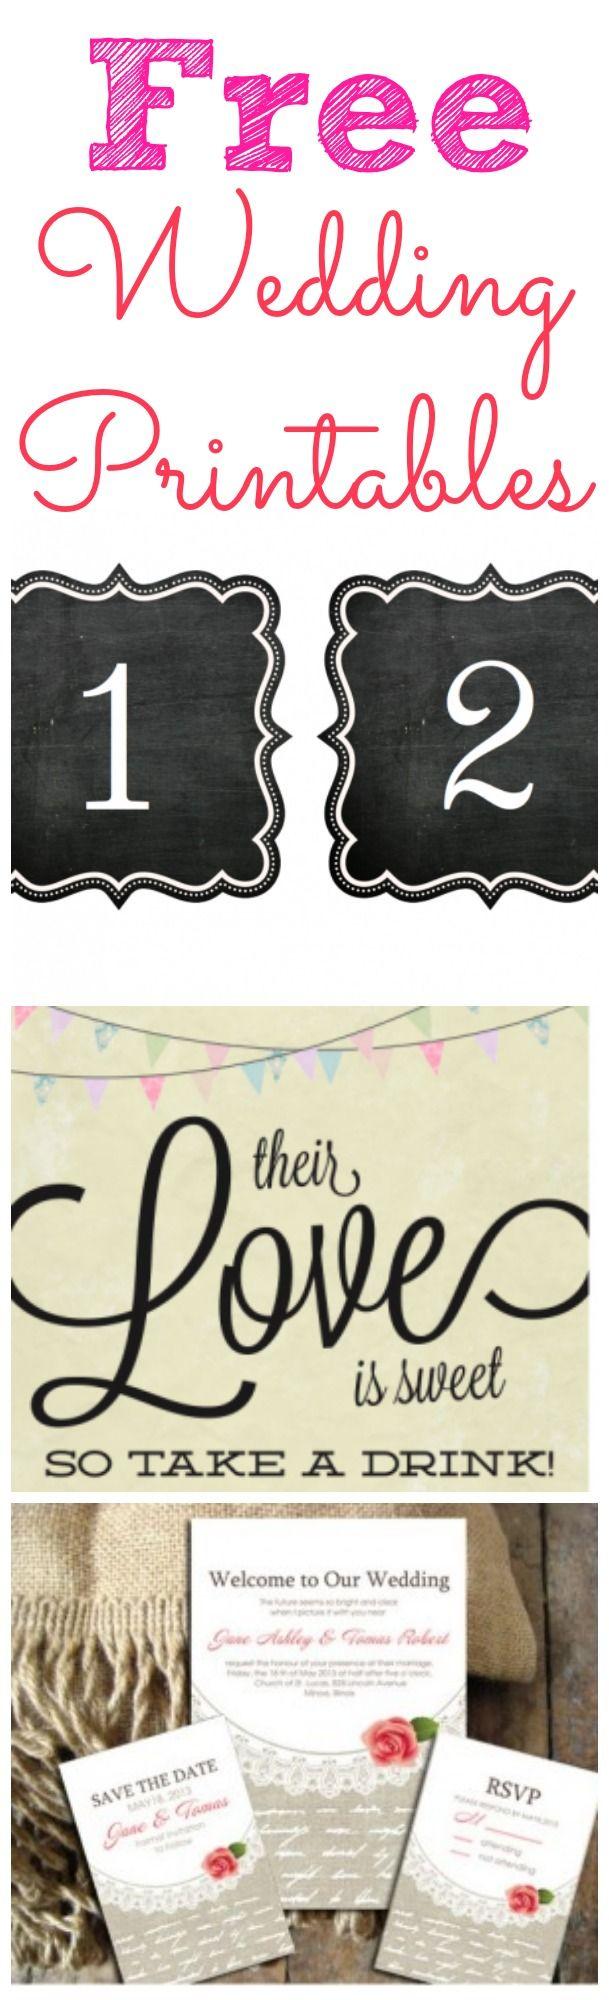 14 best wedding printables images on pinterest rustic wedding chic free wedding printables for your wedding junglespirit Image collections